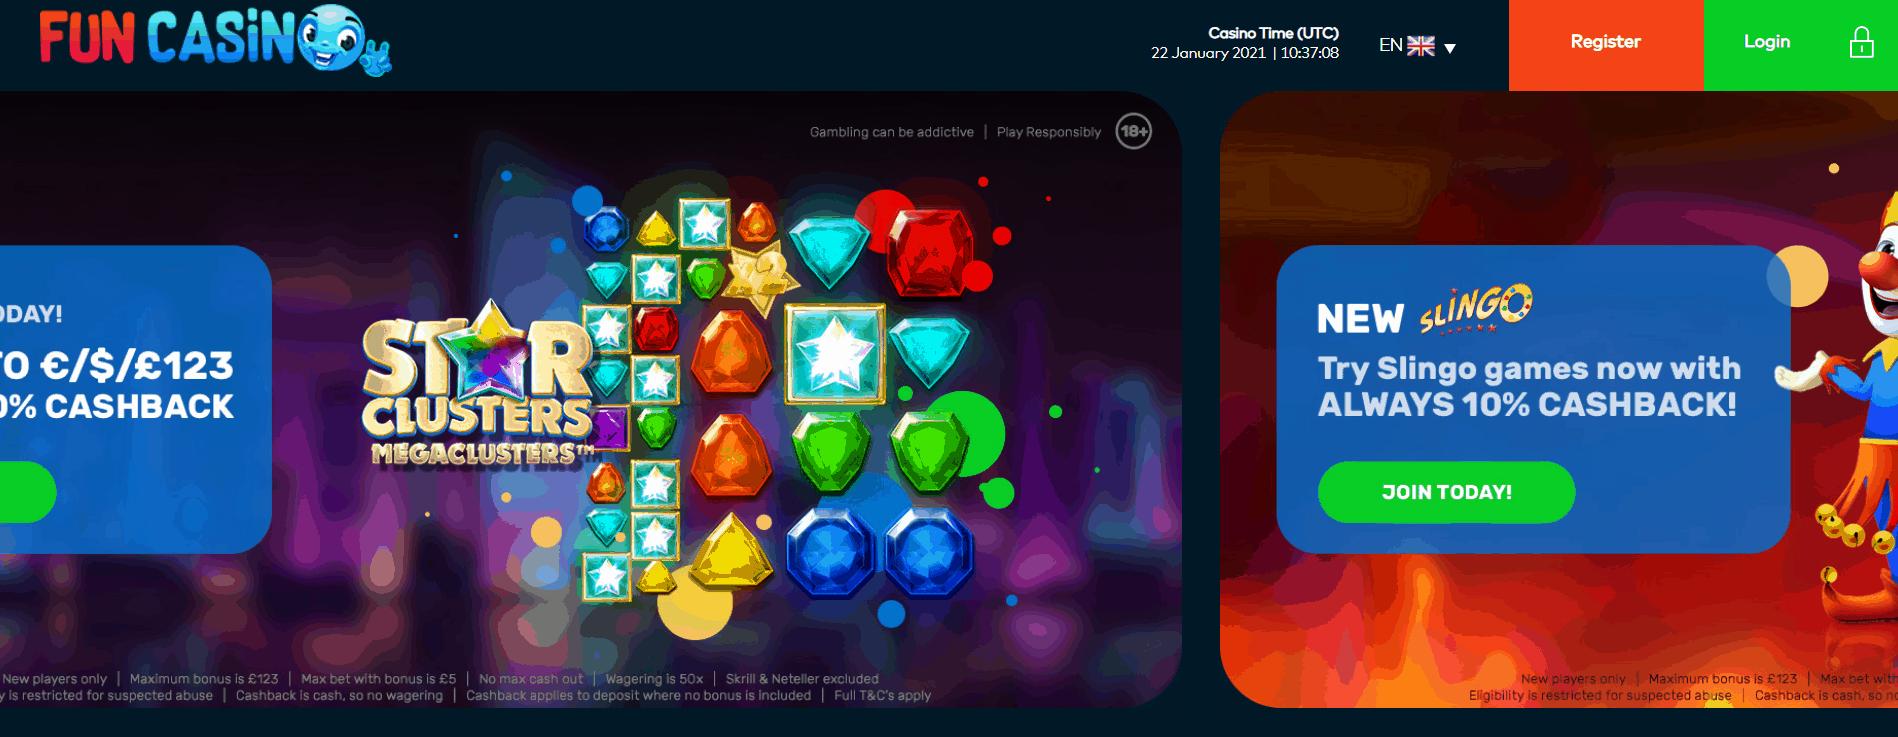 Fun Casino_Bonuses